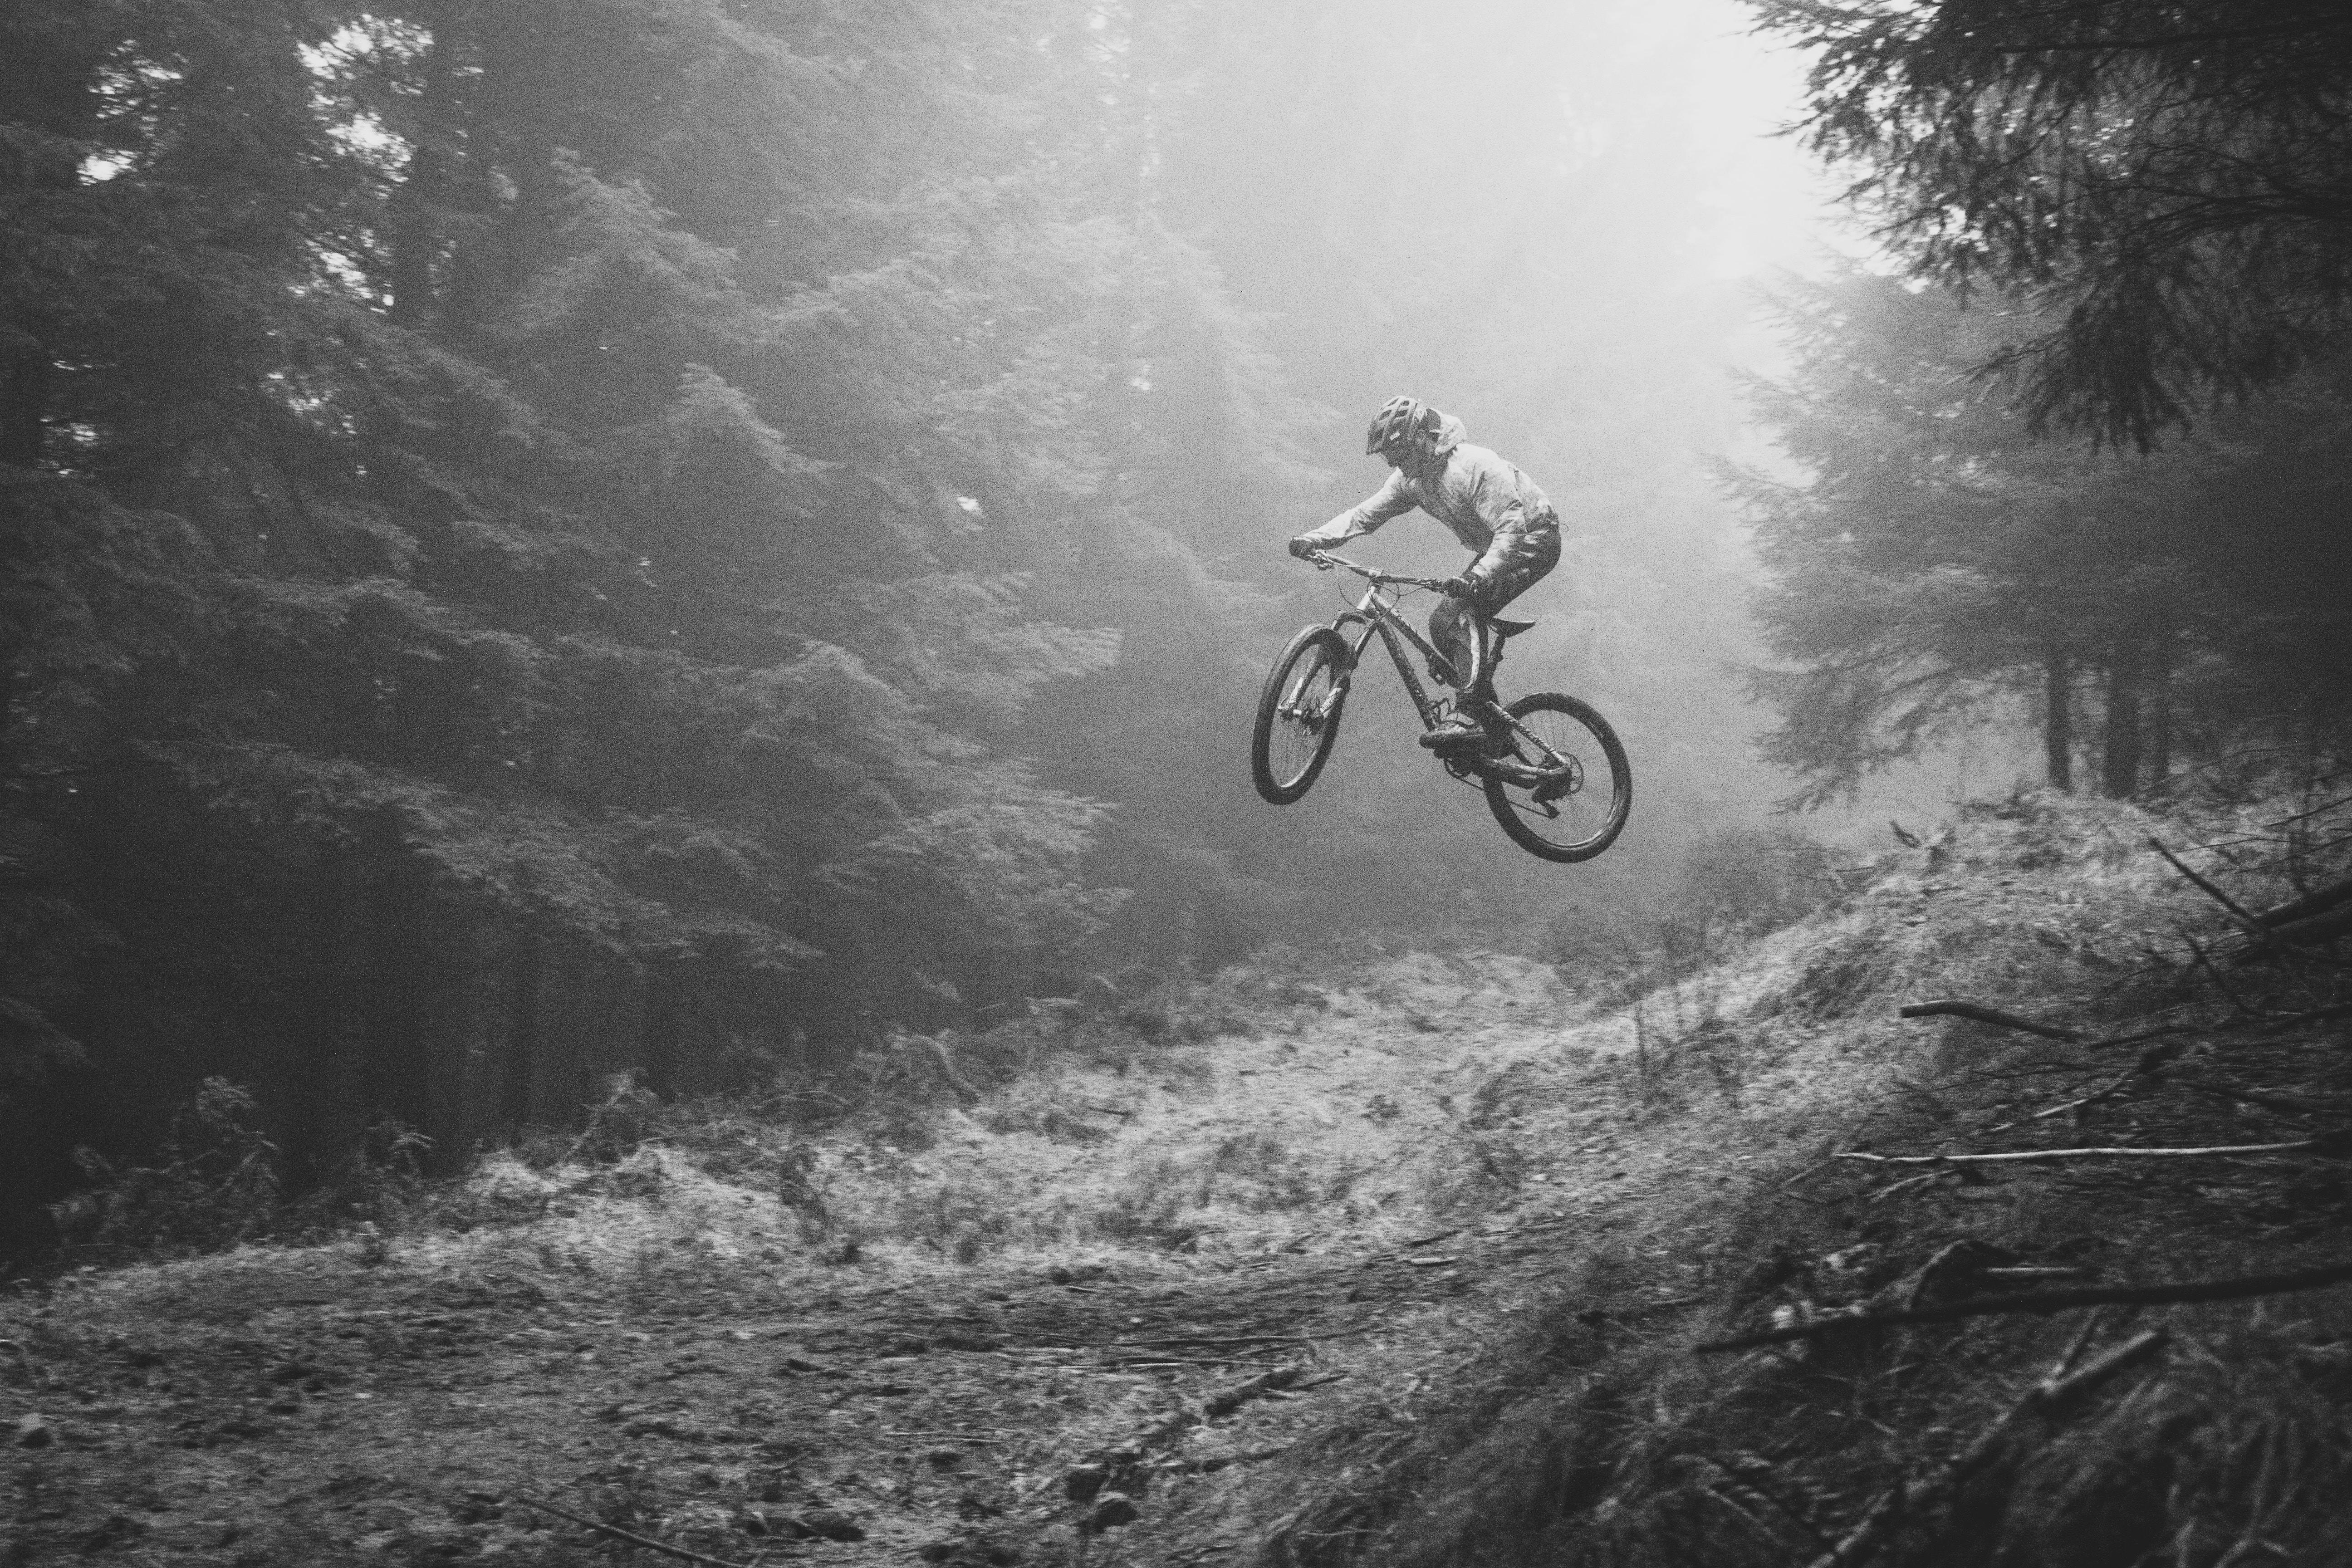 Le cyclocross en mode vulgaire